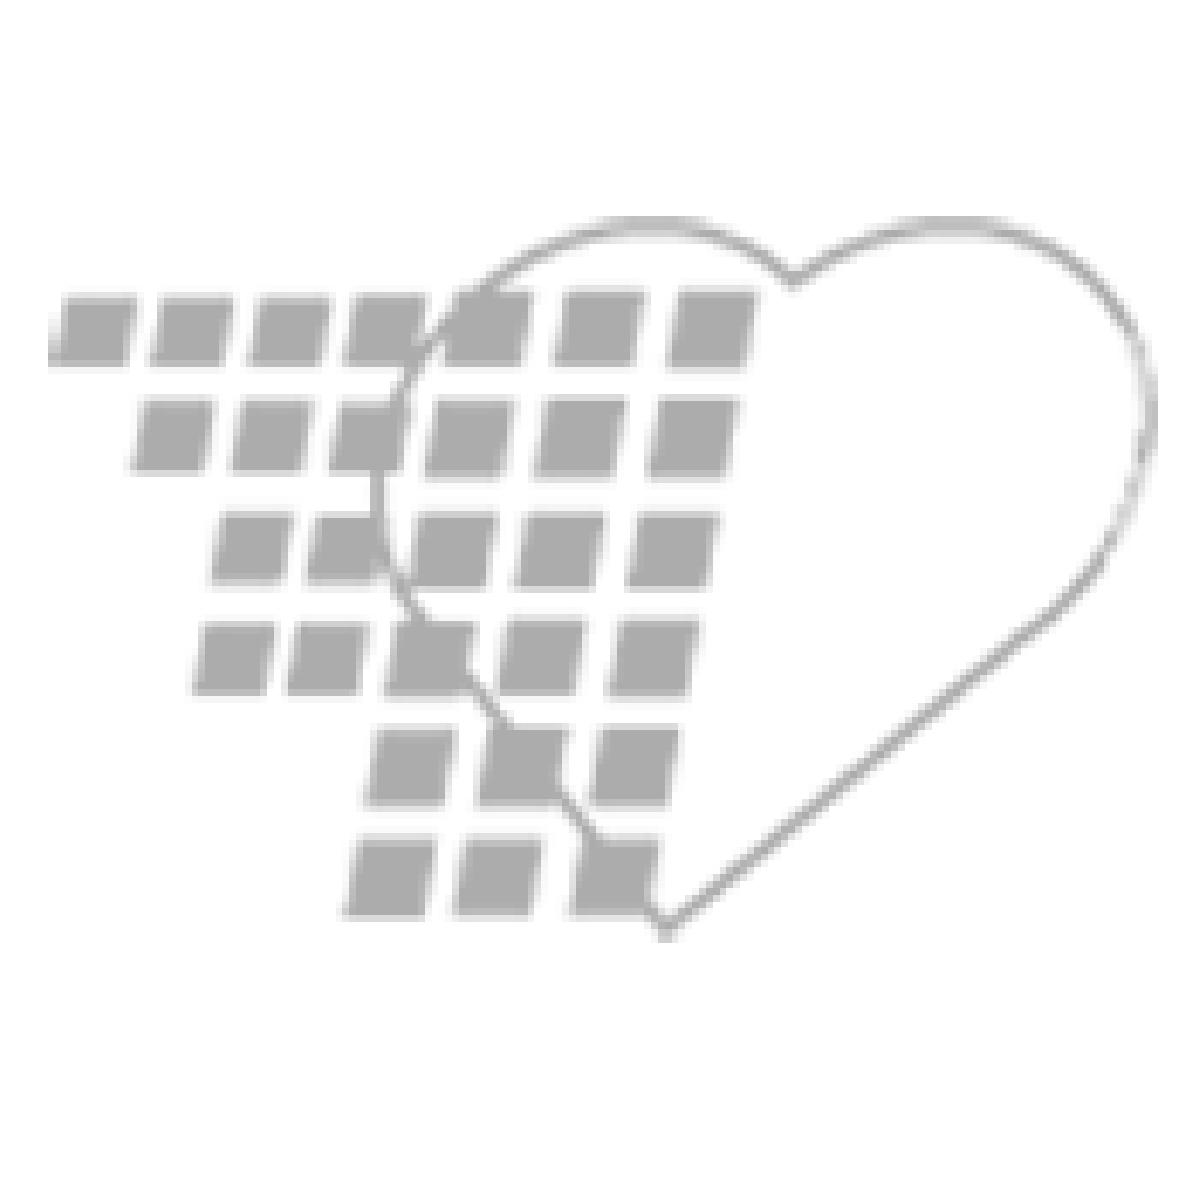 06-93-3224 Demo Dose® Neostigmin Methylsulfat Injection 10mg/10mL 10mL